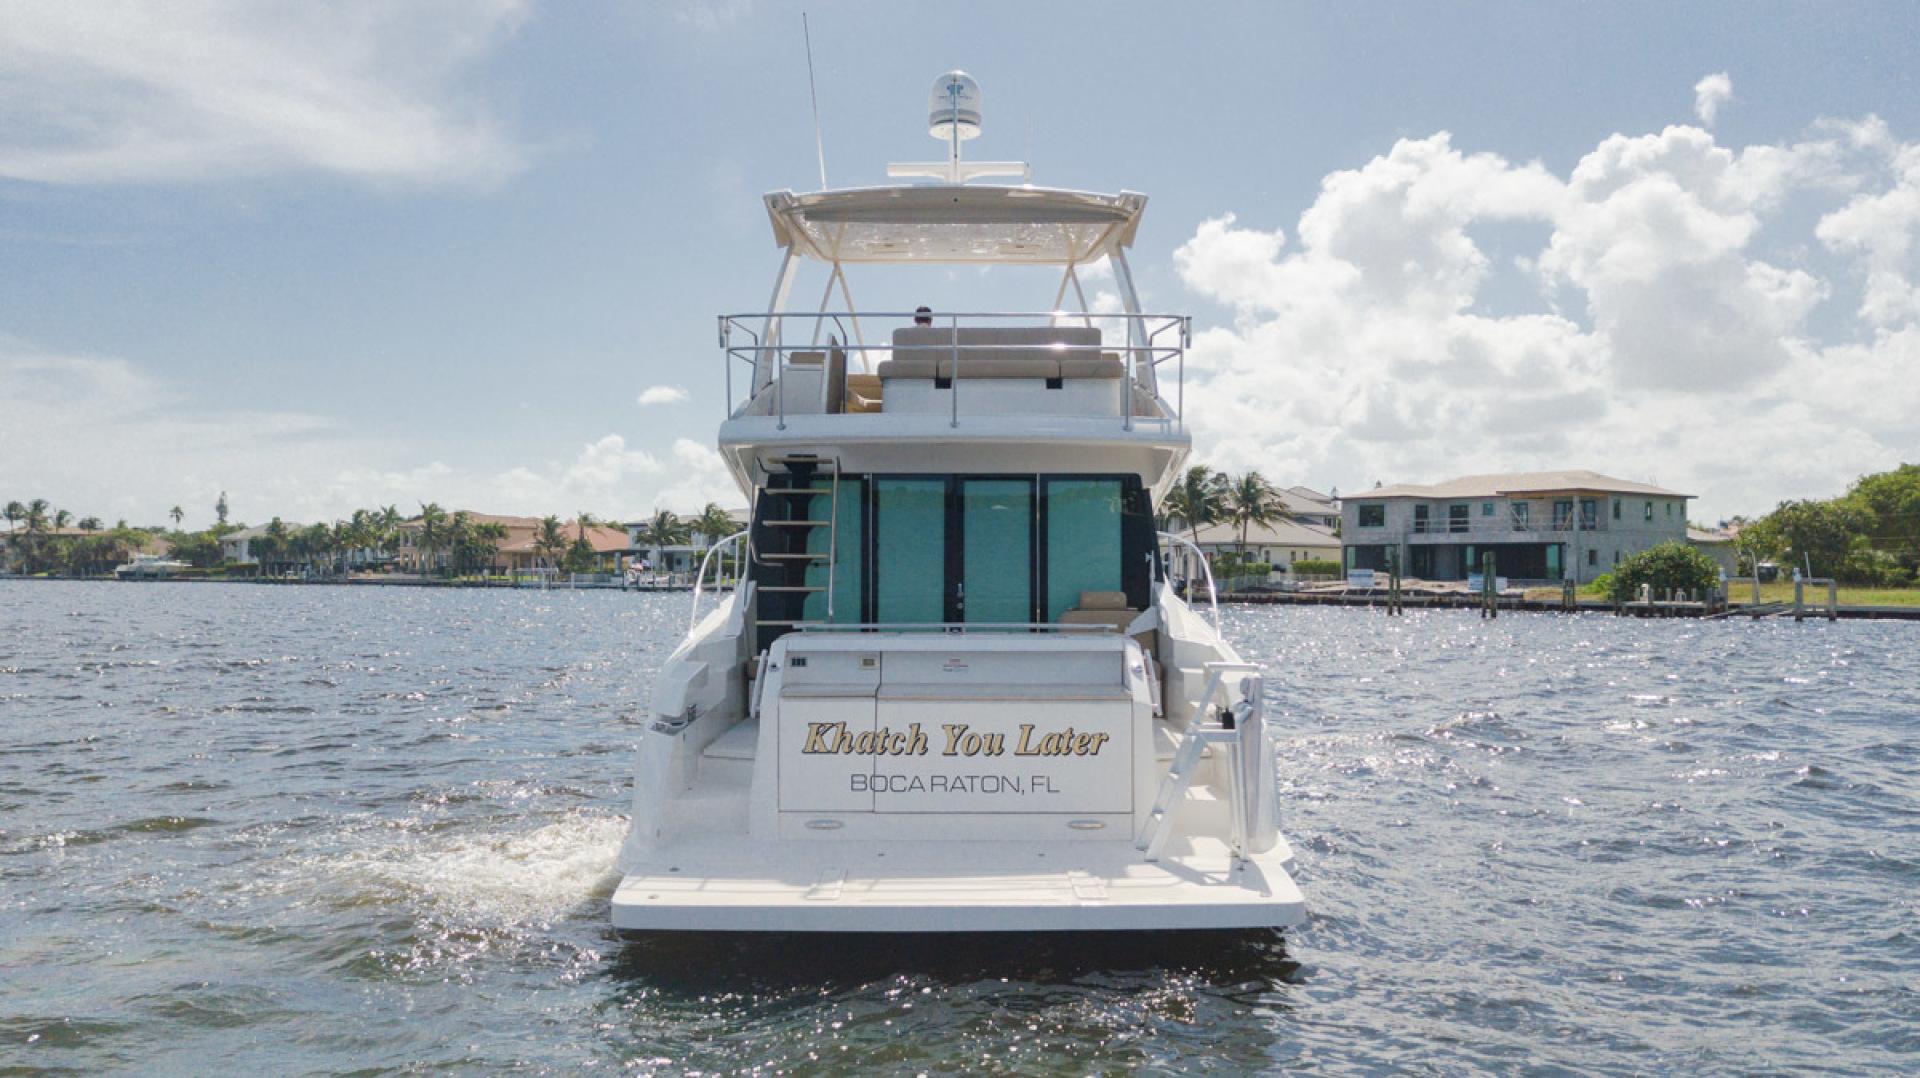 Tiara Yachts-50 Flybridge 2015-Khatch You Later North Palm Beach-Florida-United States-Khatch You Later-1509533 | Thumbnail